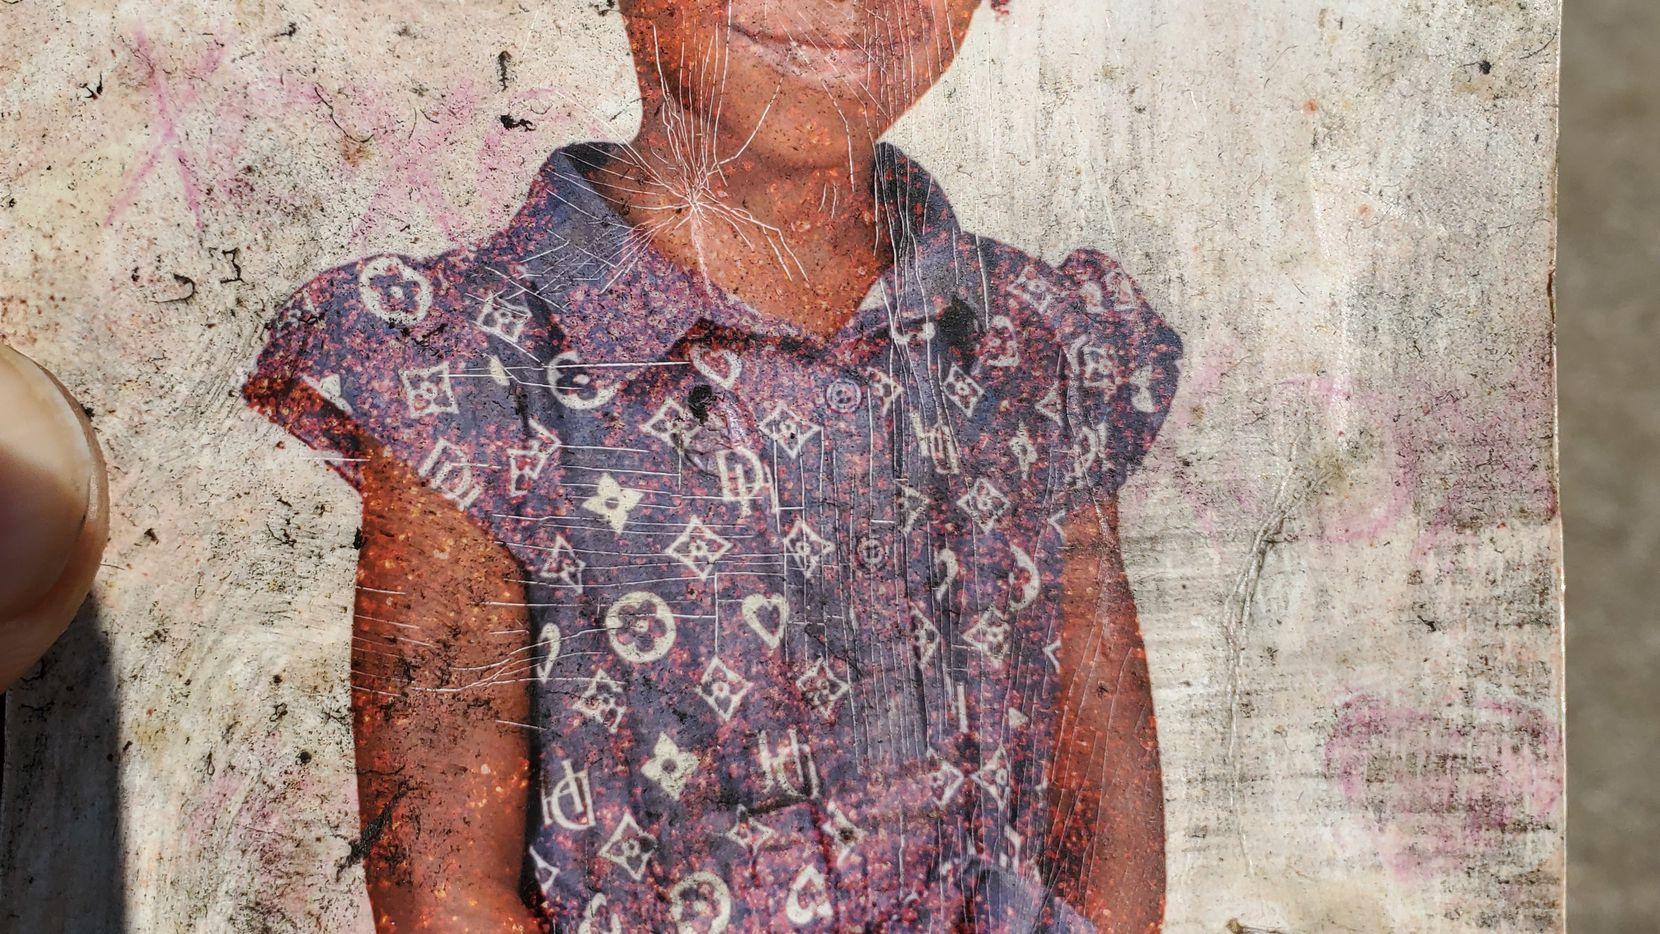 Brandoniya Bennett, the 9-year-old girl killed at Roseland Townhomes